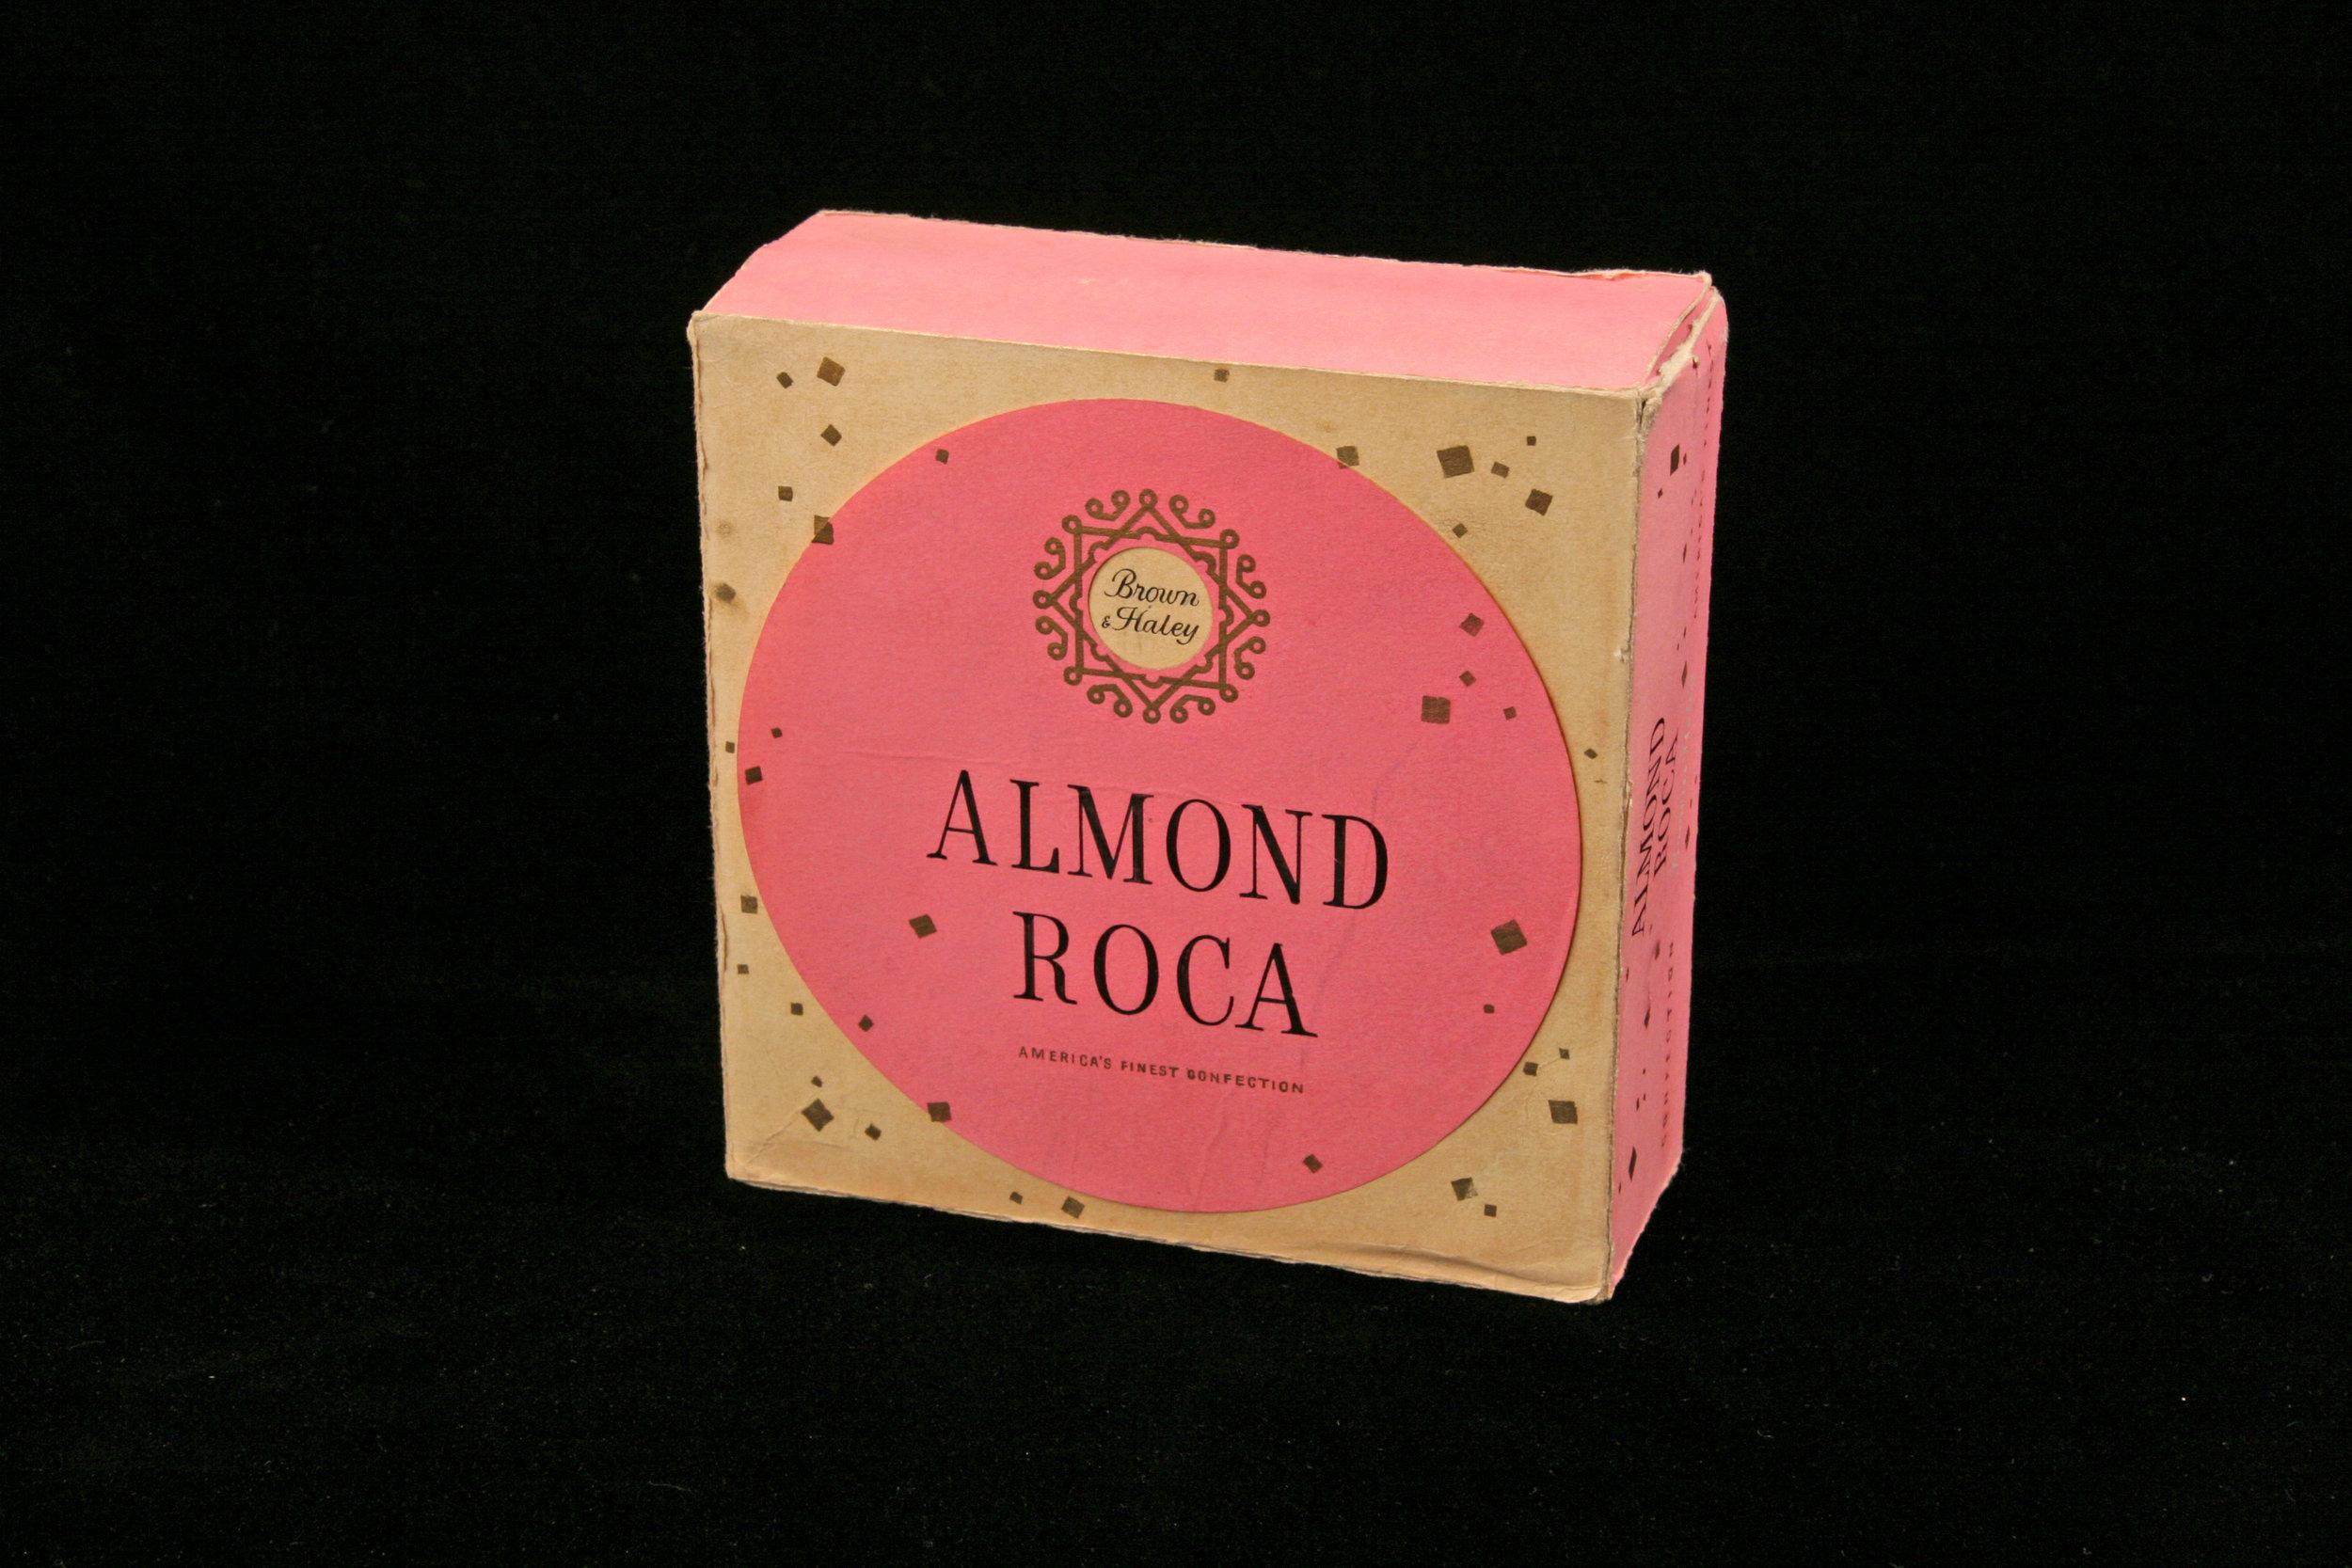 VINTAGE ALMOND ROCA BOX